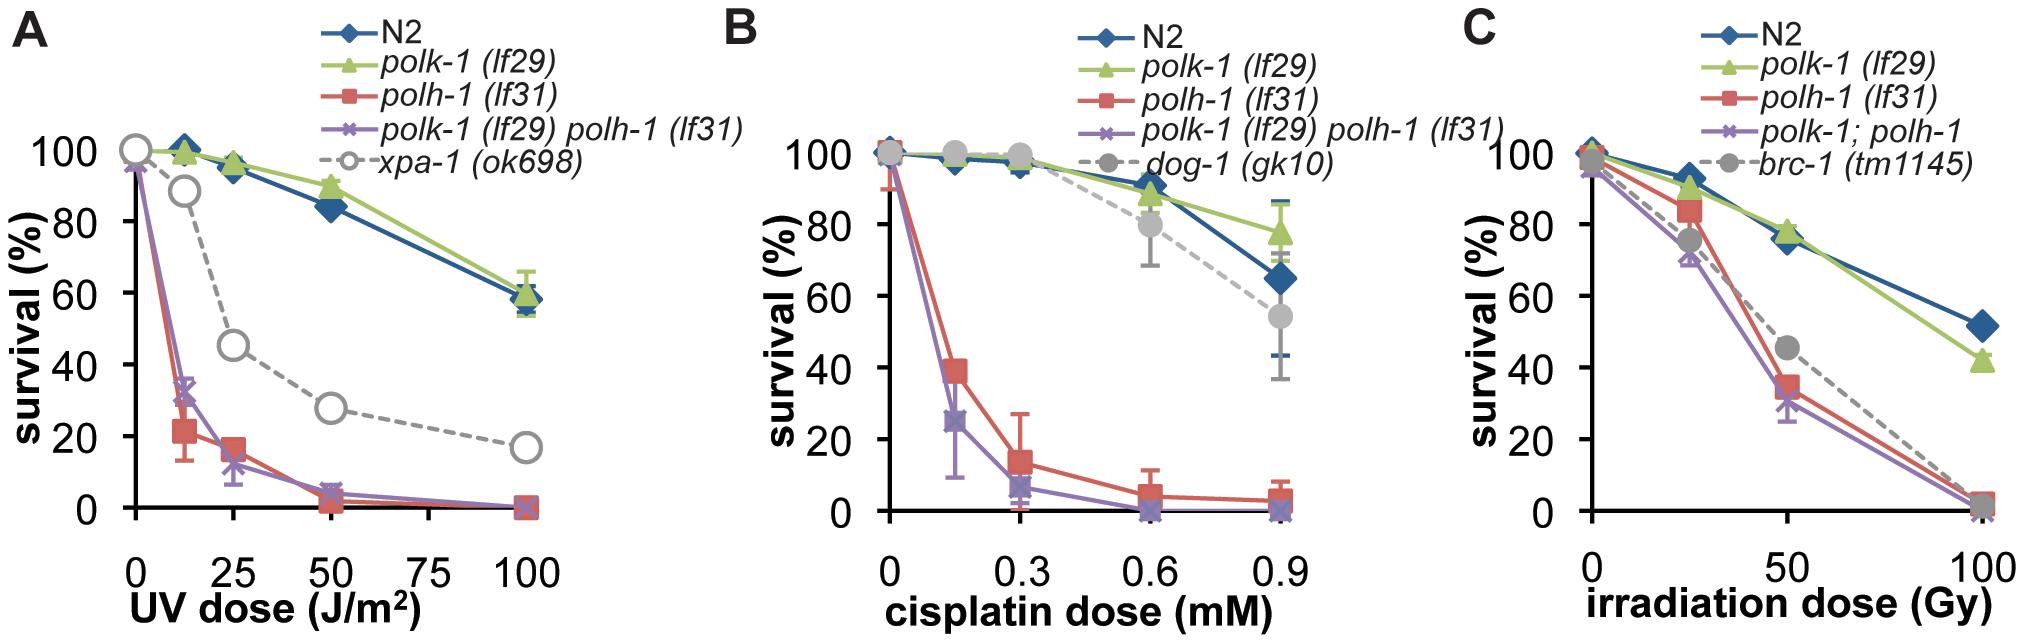 Germline sensitivity of <i>polh-1</i> and <i>polk-1</i> mutants to different sources of DNA damage.